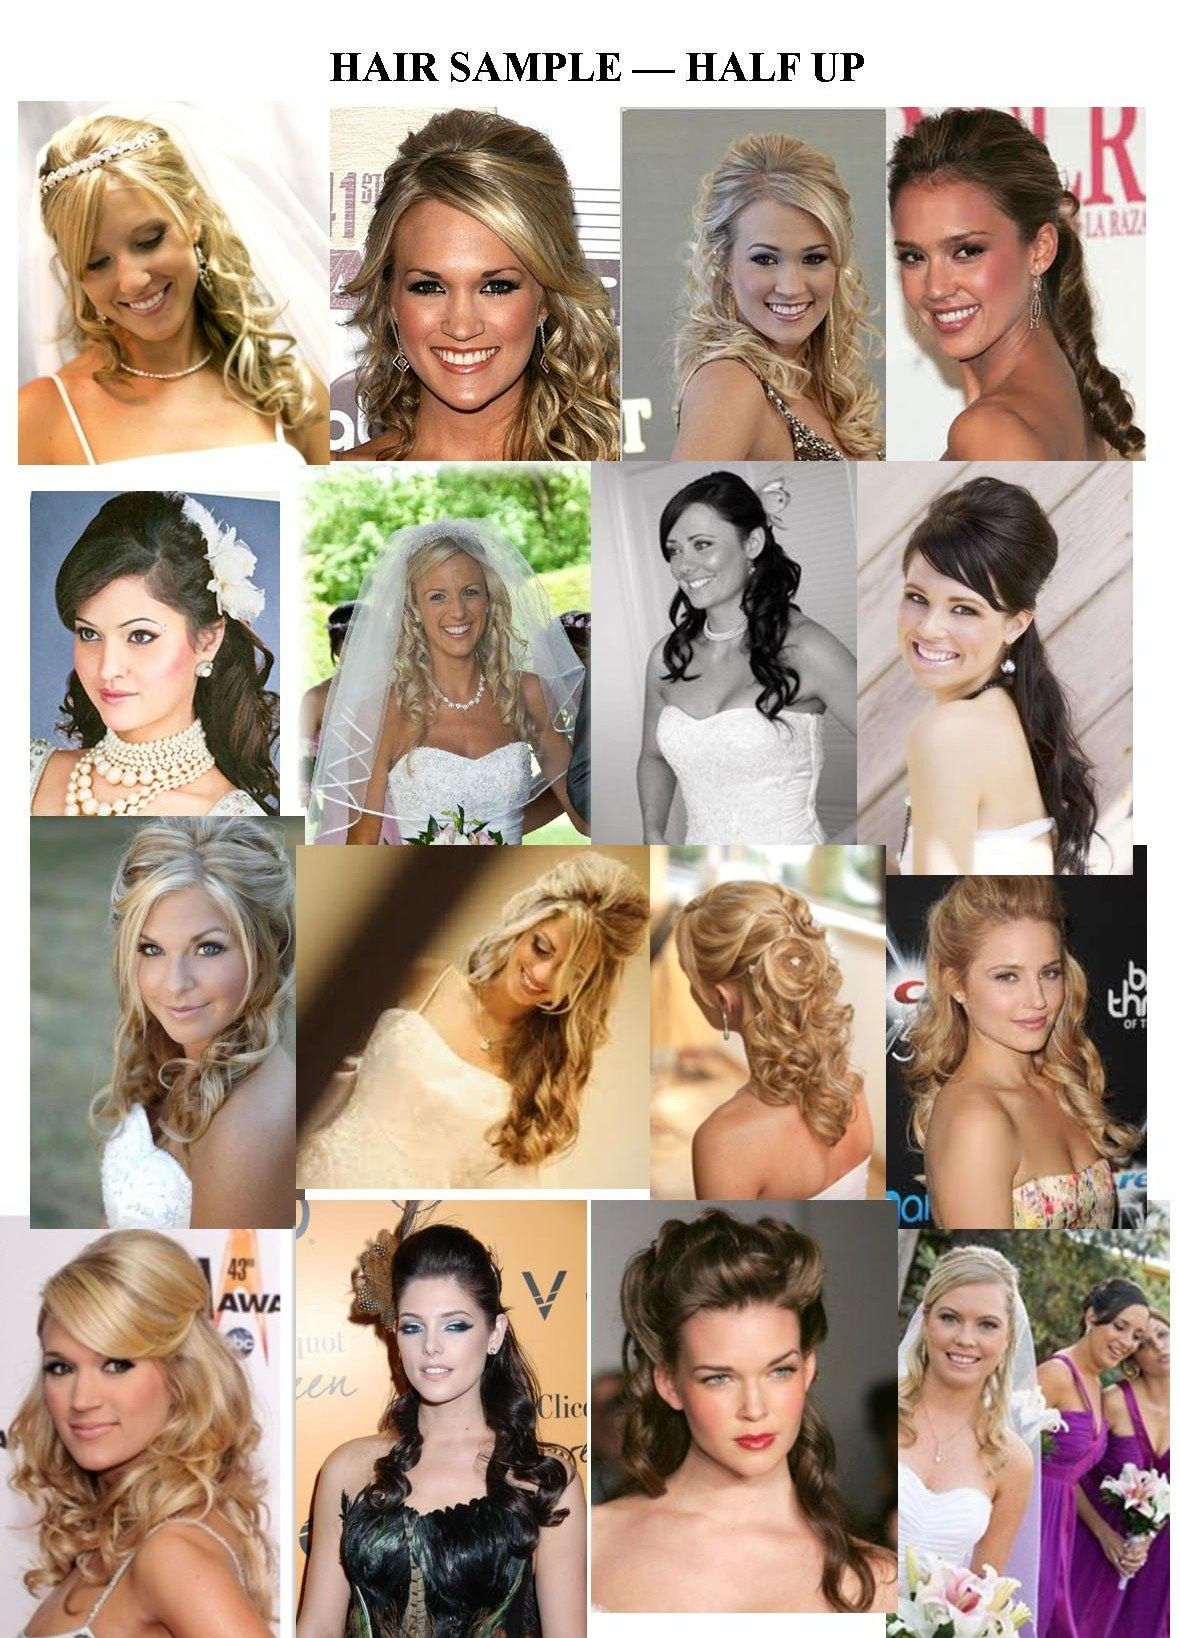 hair styles Hair styles, Prom hair, Hair